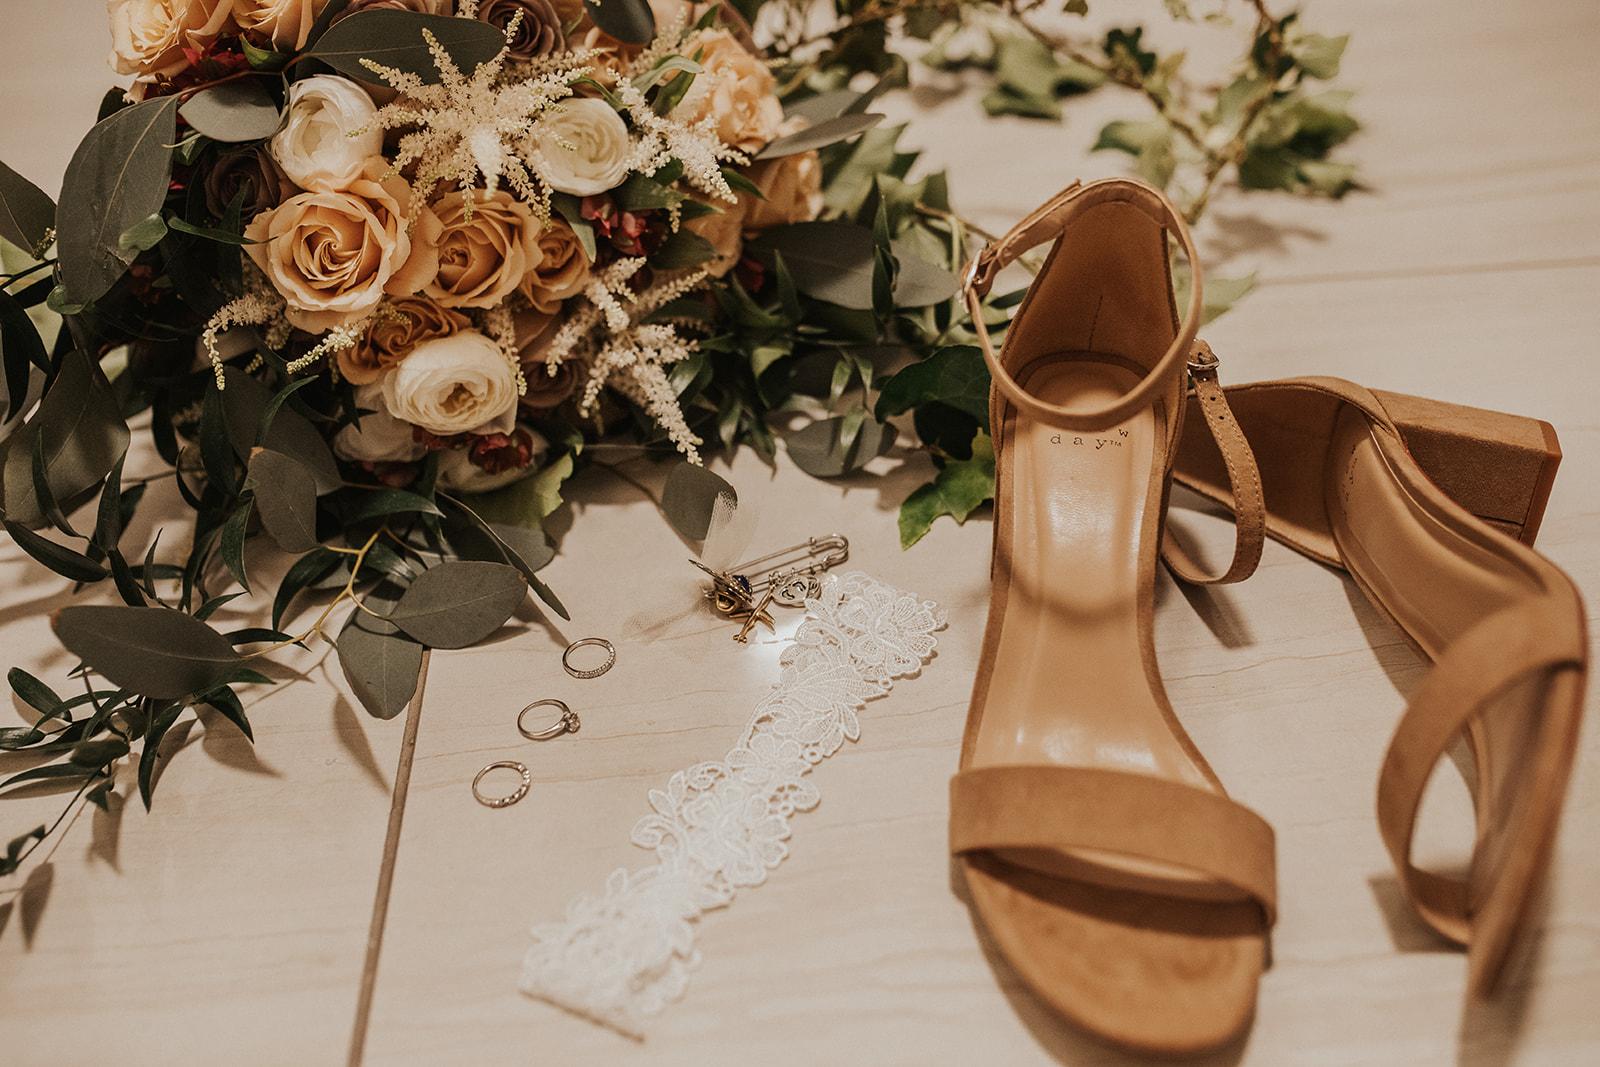 spokane bride unique warm vegas wedding